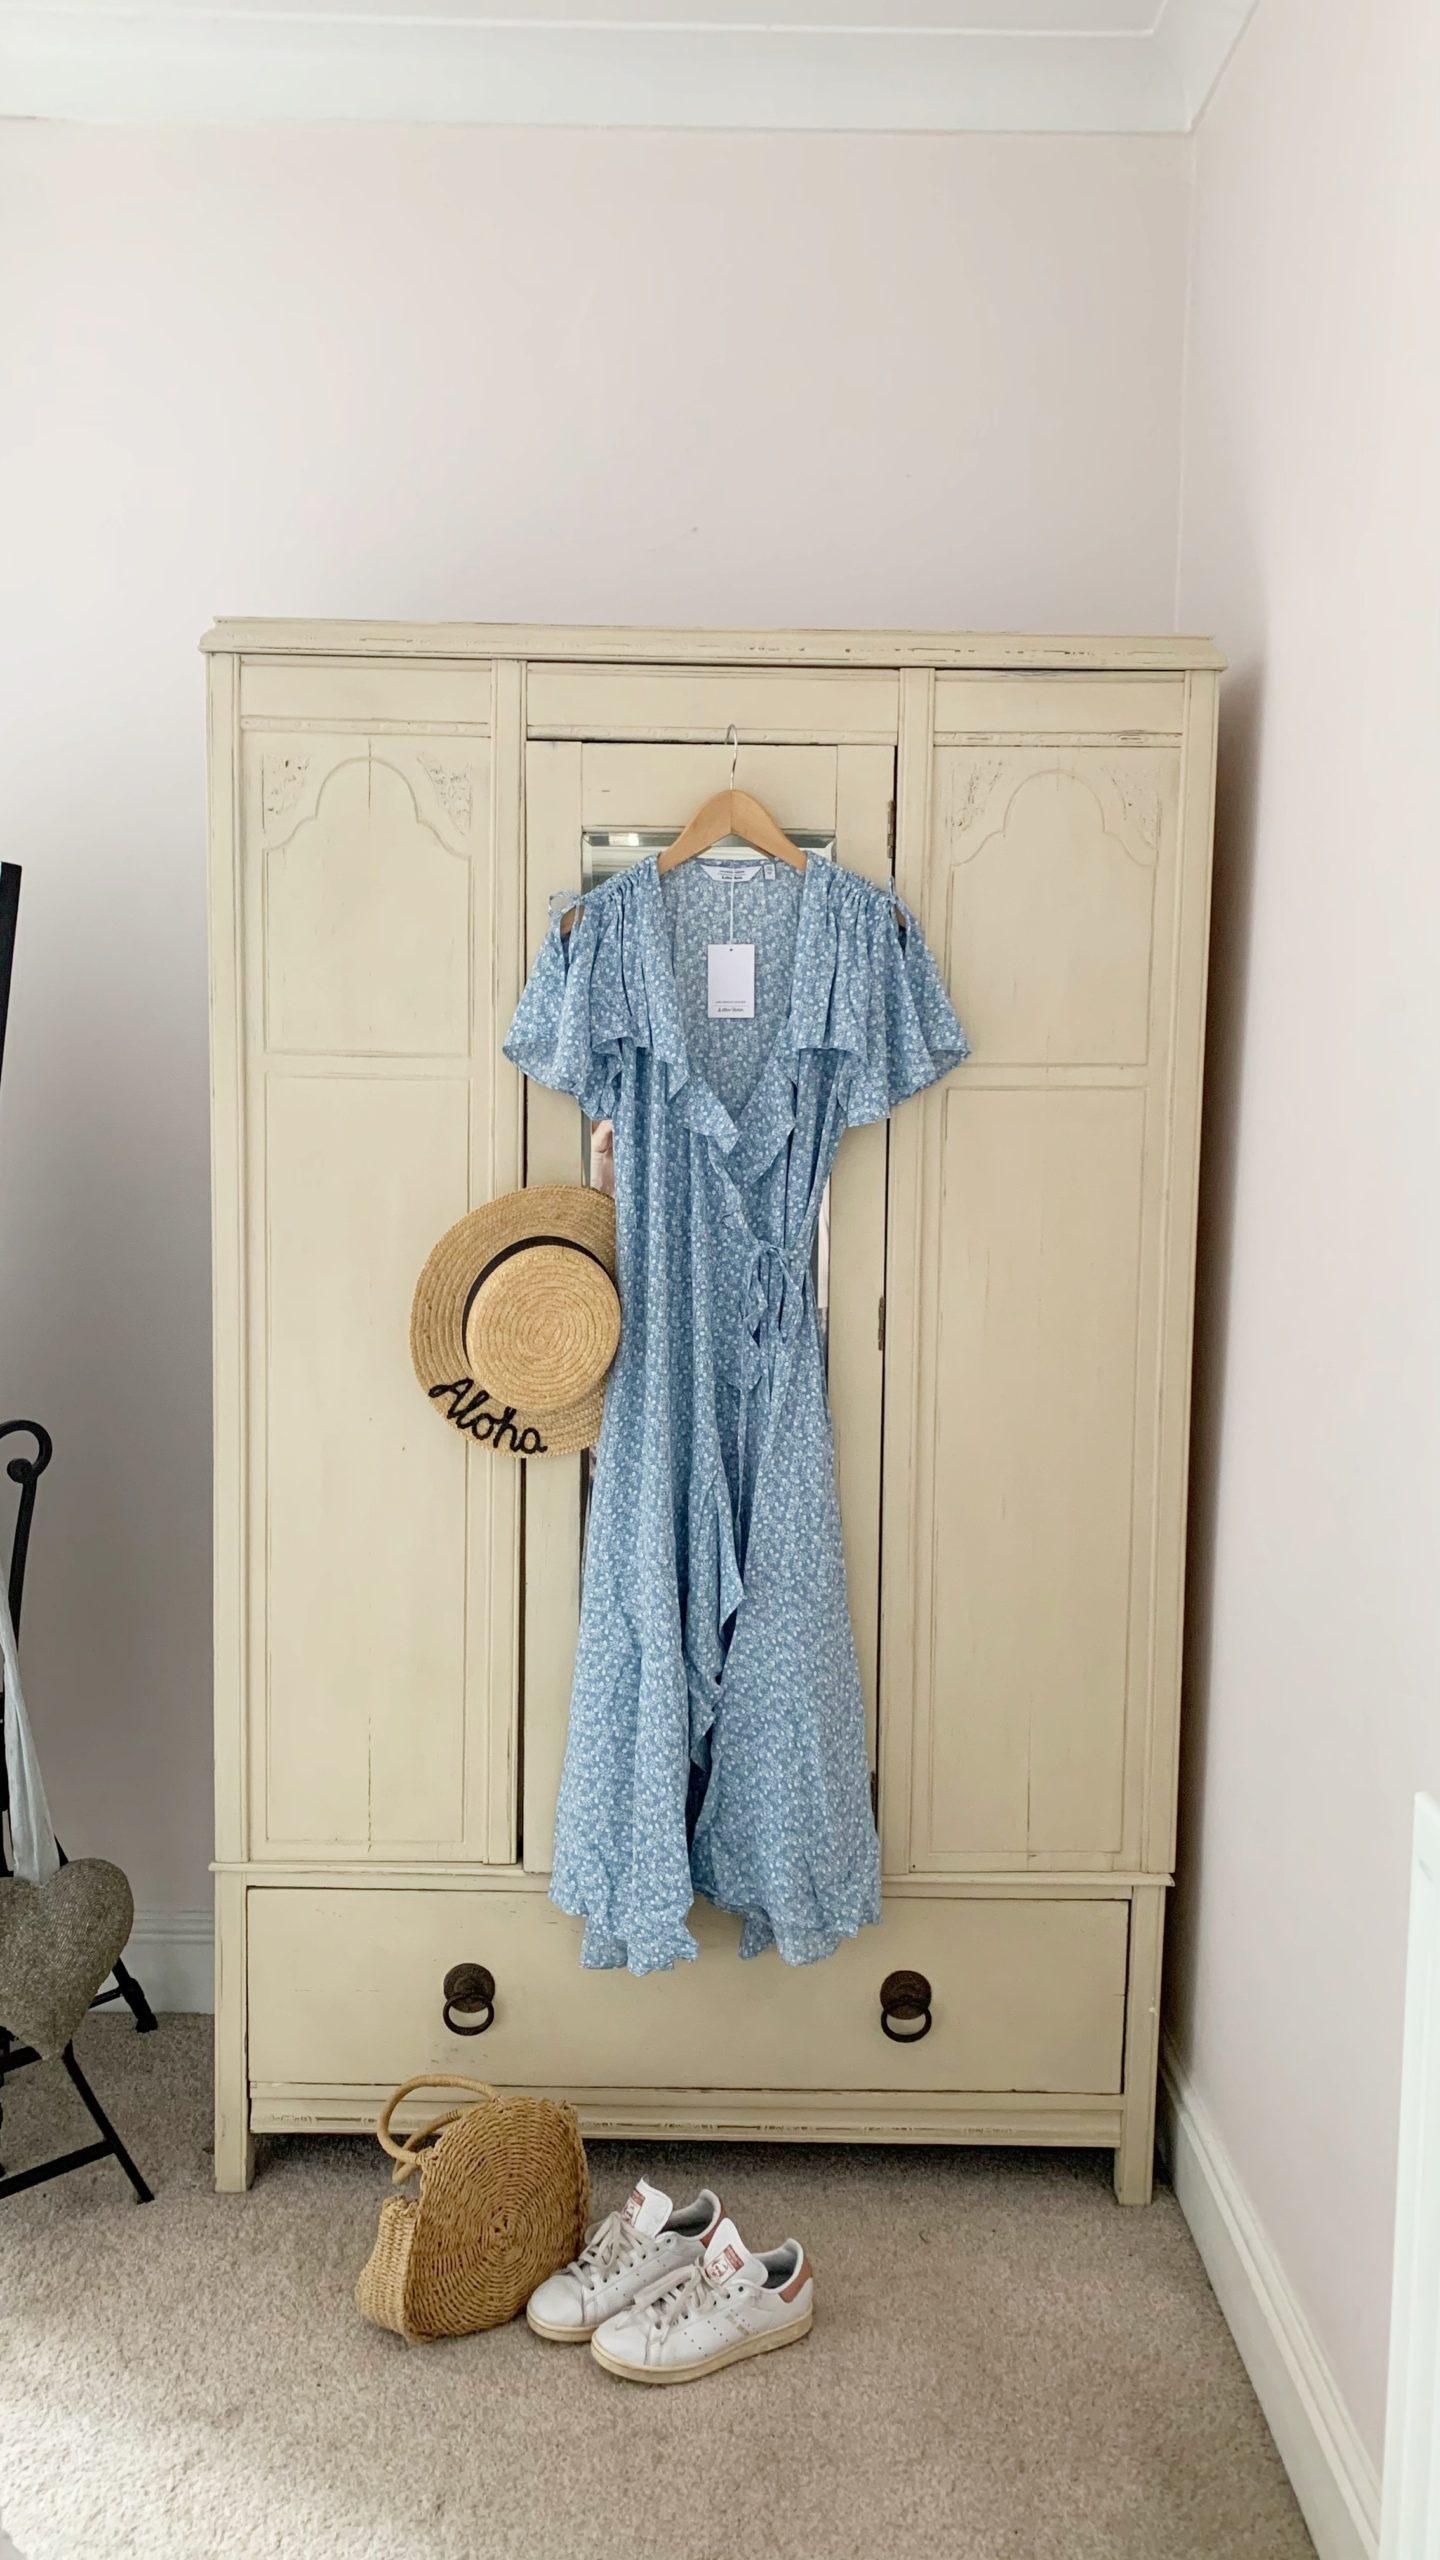 A Little Spring Wardrobe Love